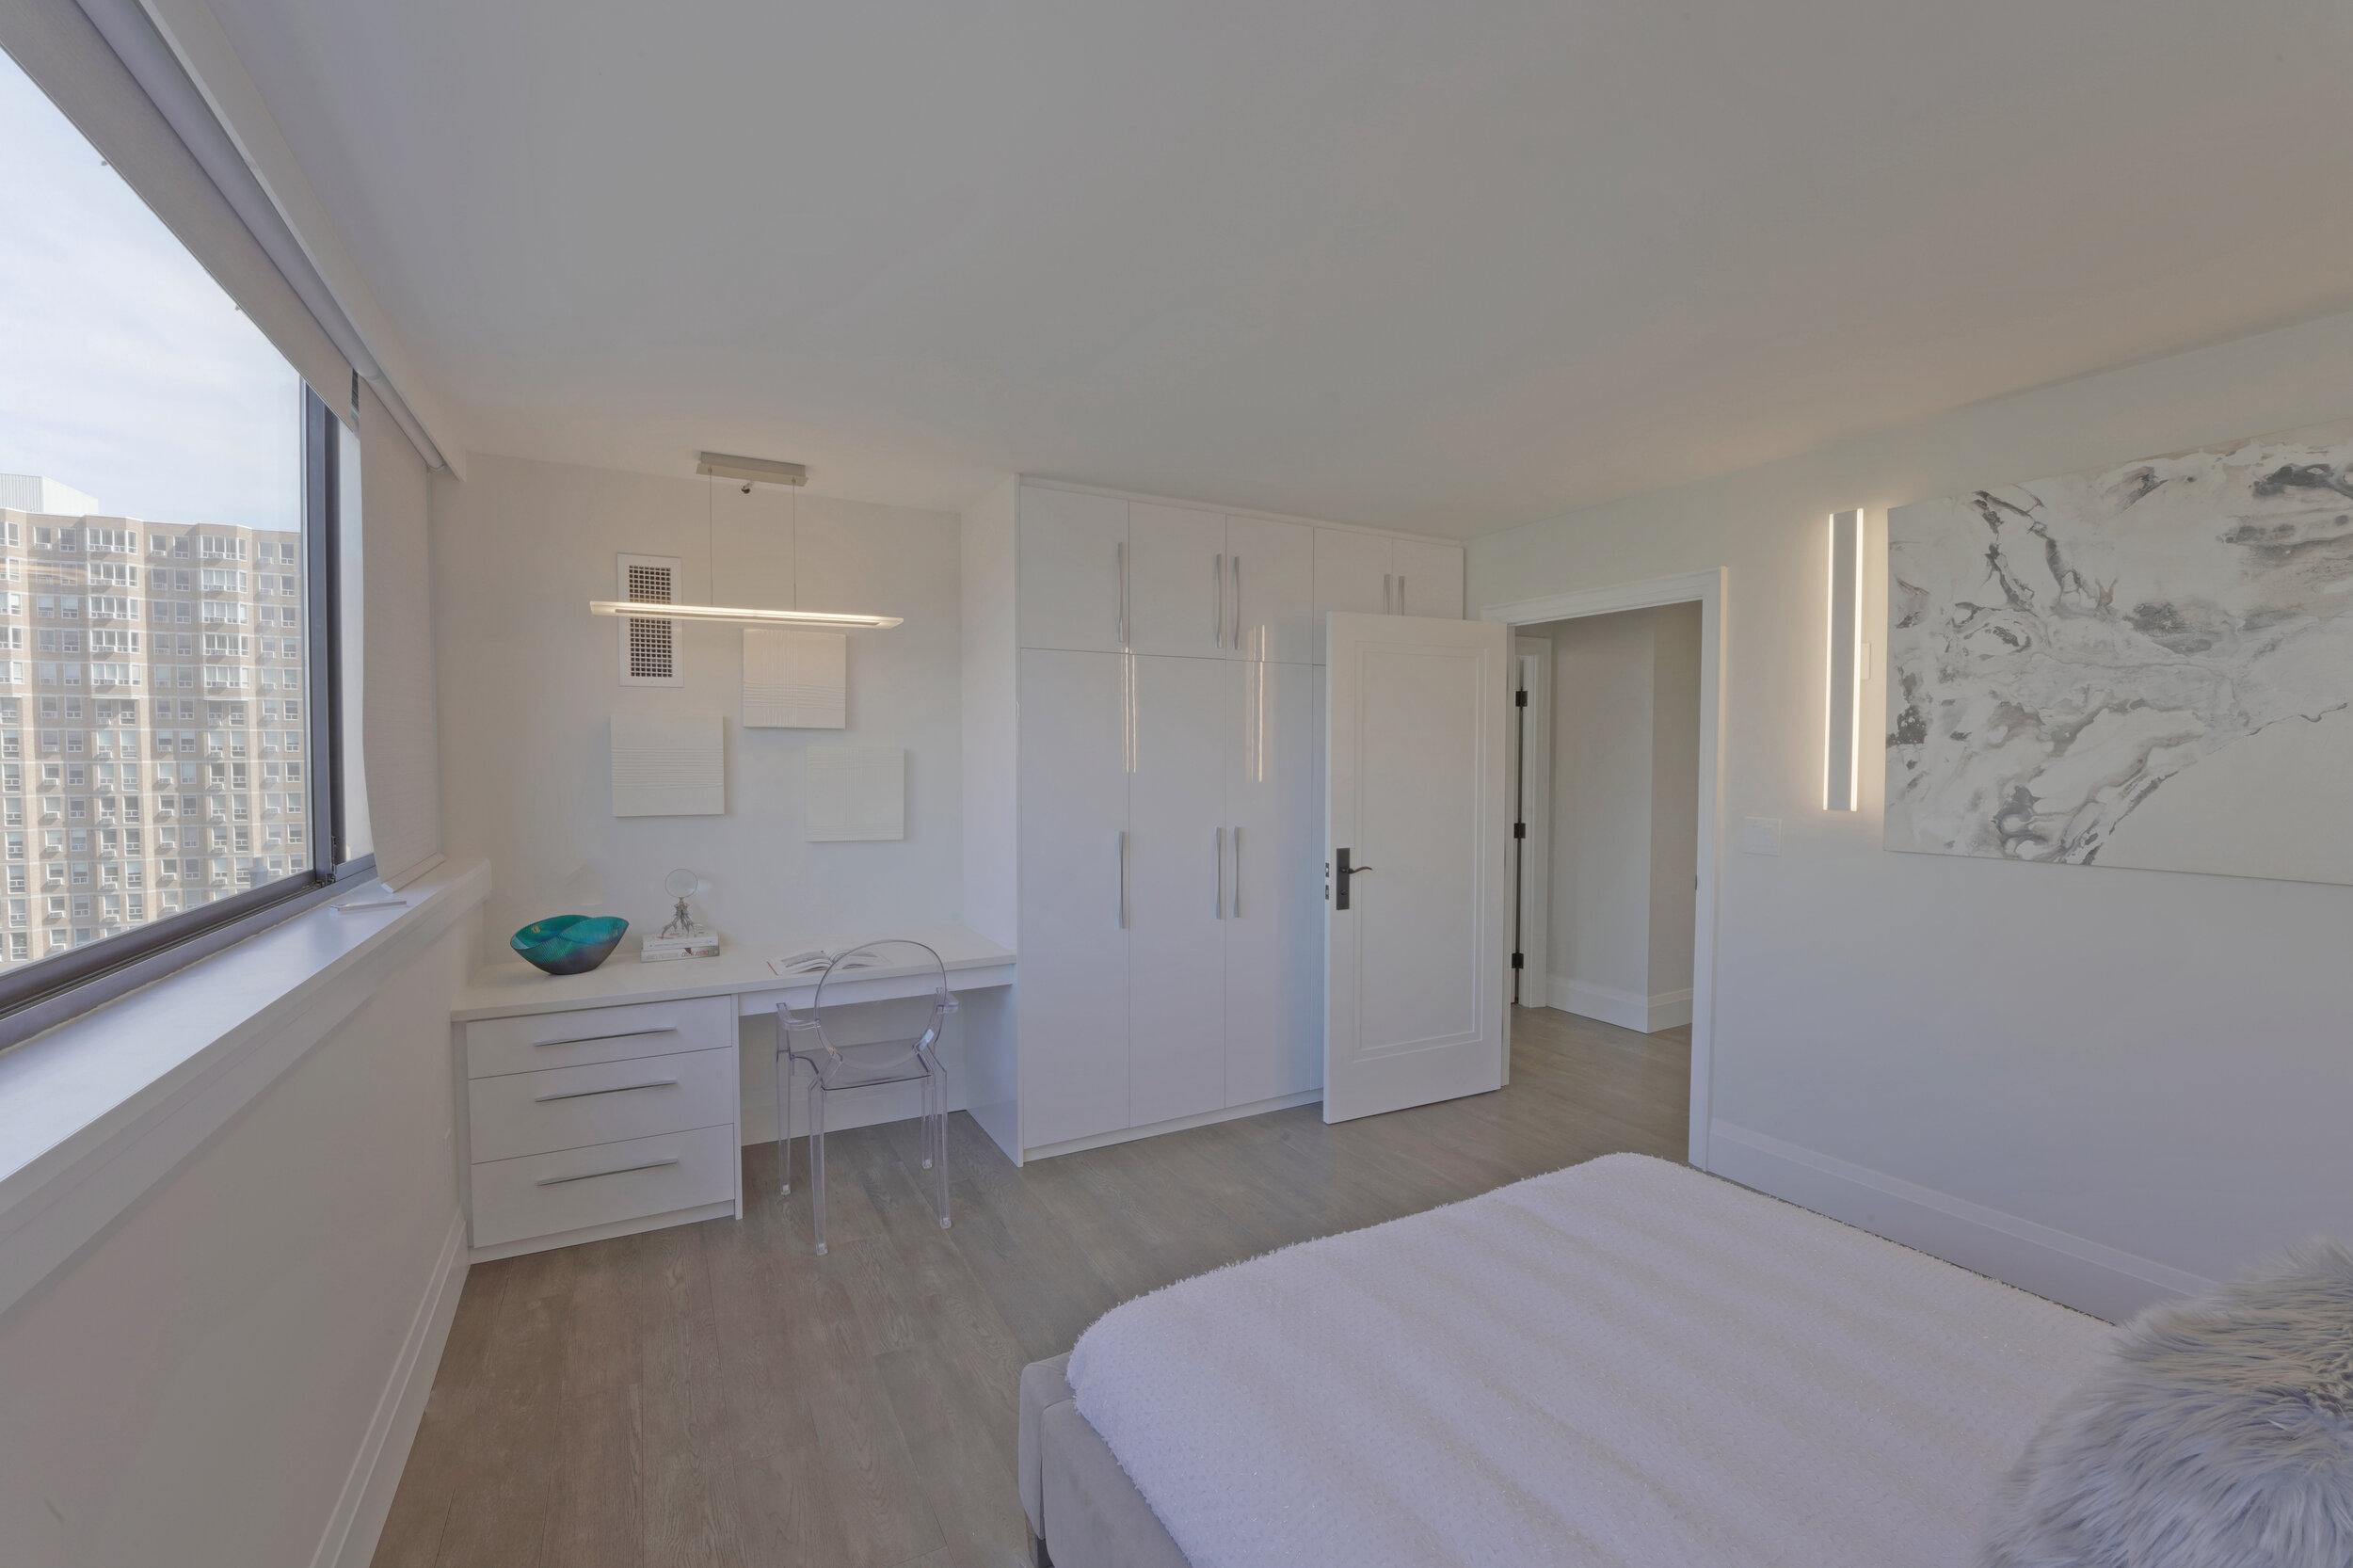 15 - Second Bedroom 2 - DSC00527_28_29_30_31DSC00542_3_4_5_6.jpg